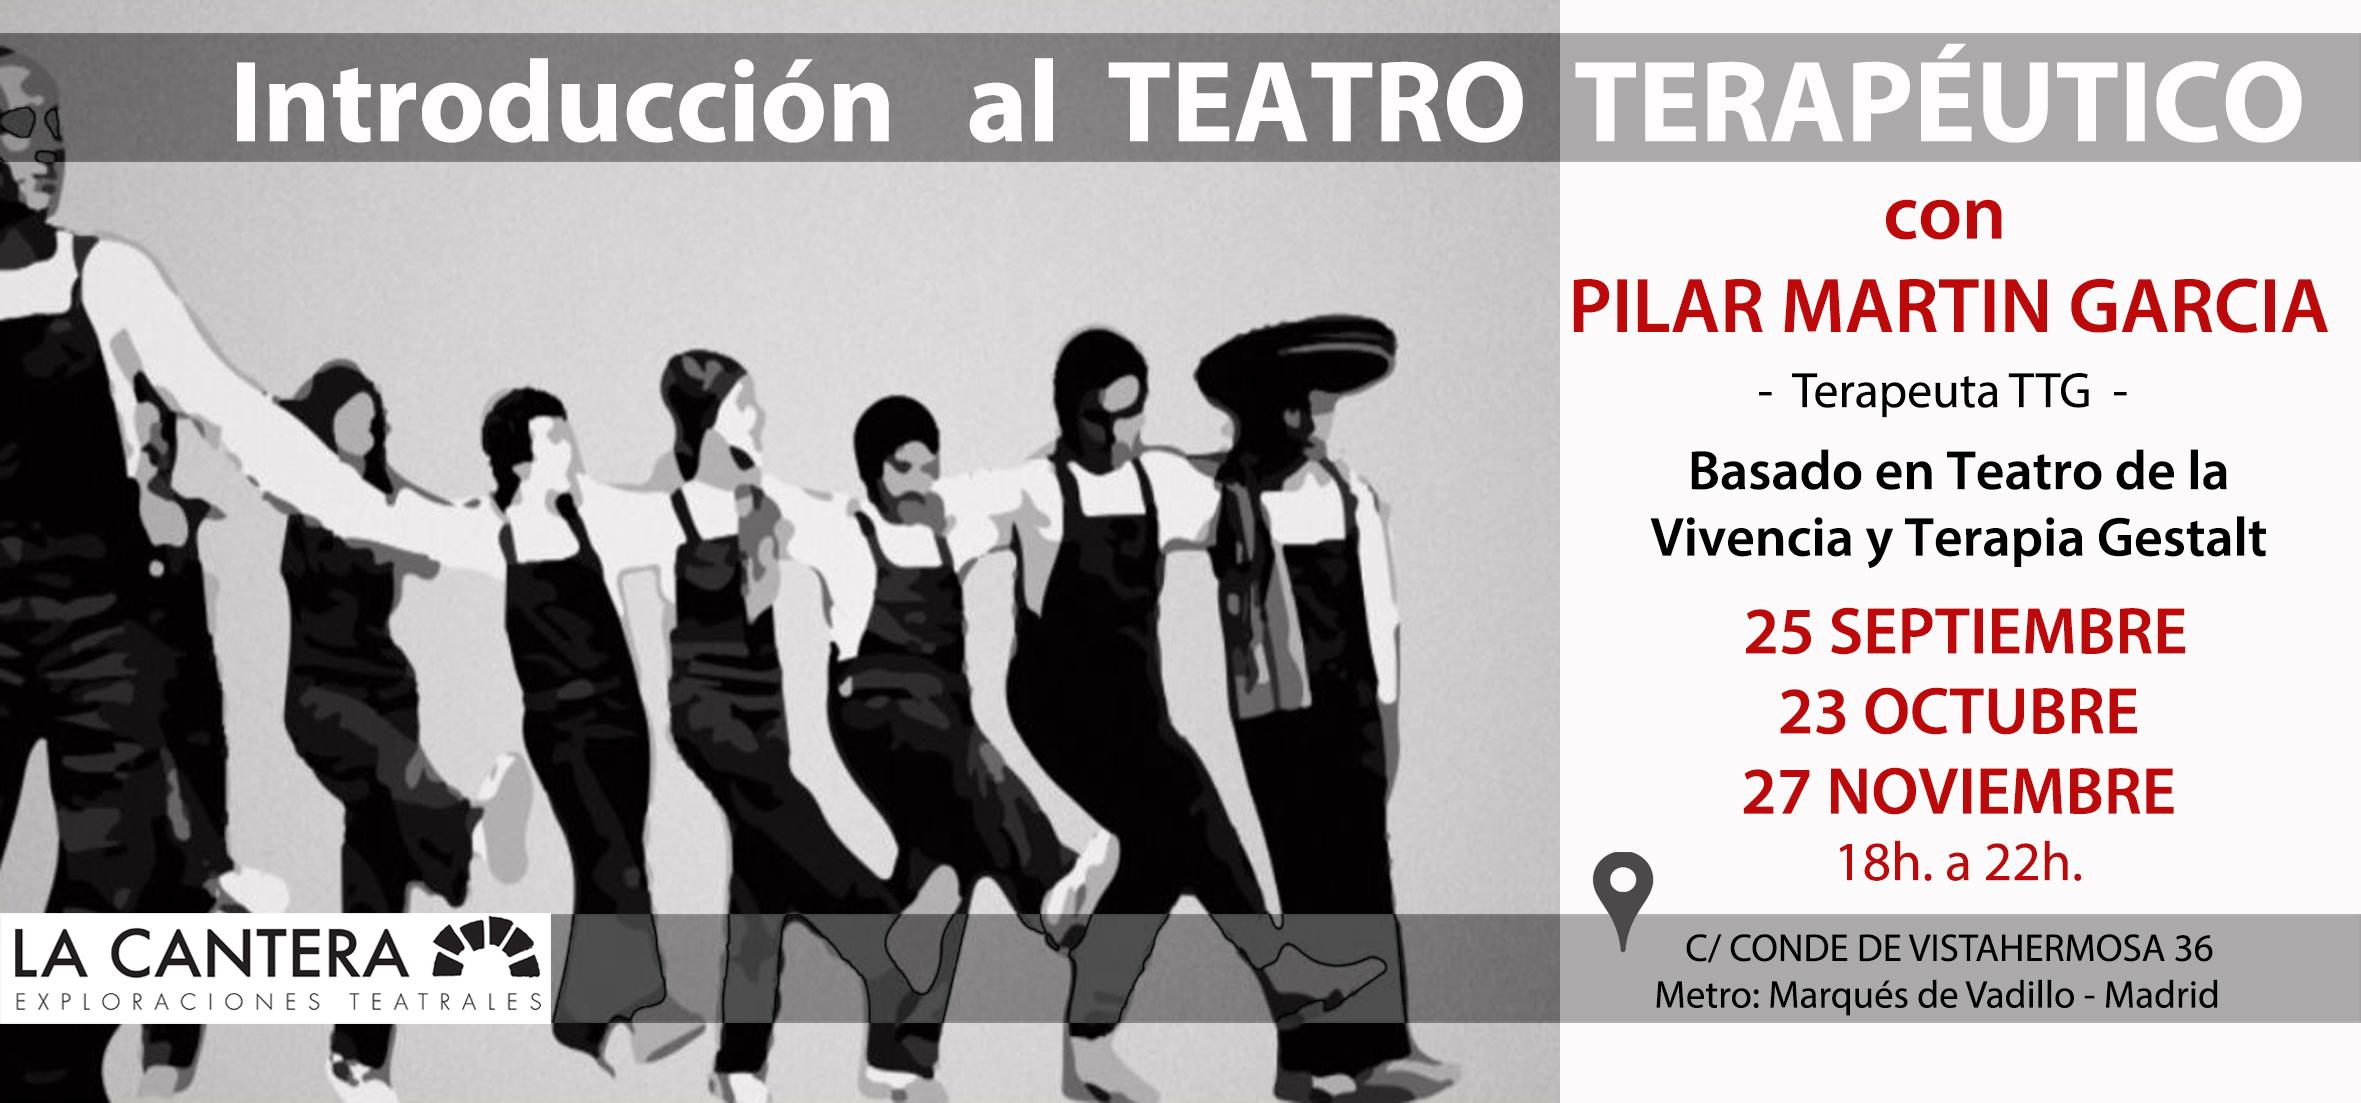 TeatroTerapeuticoWeb